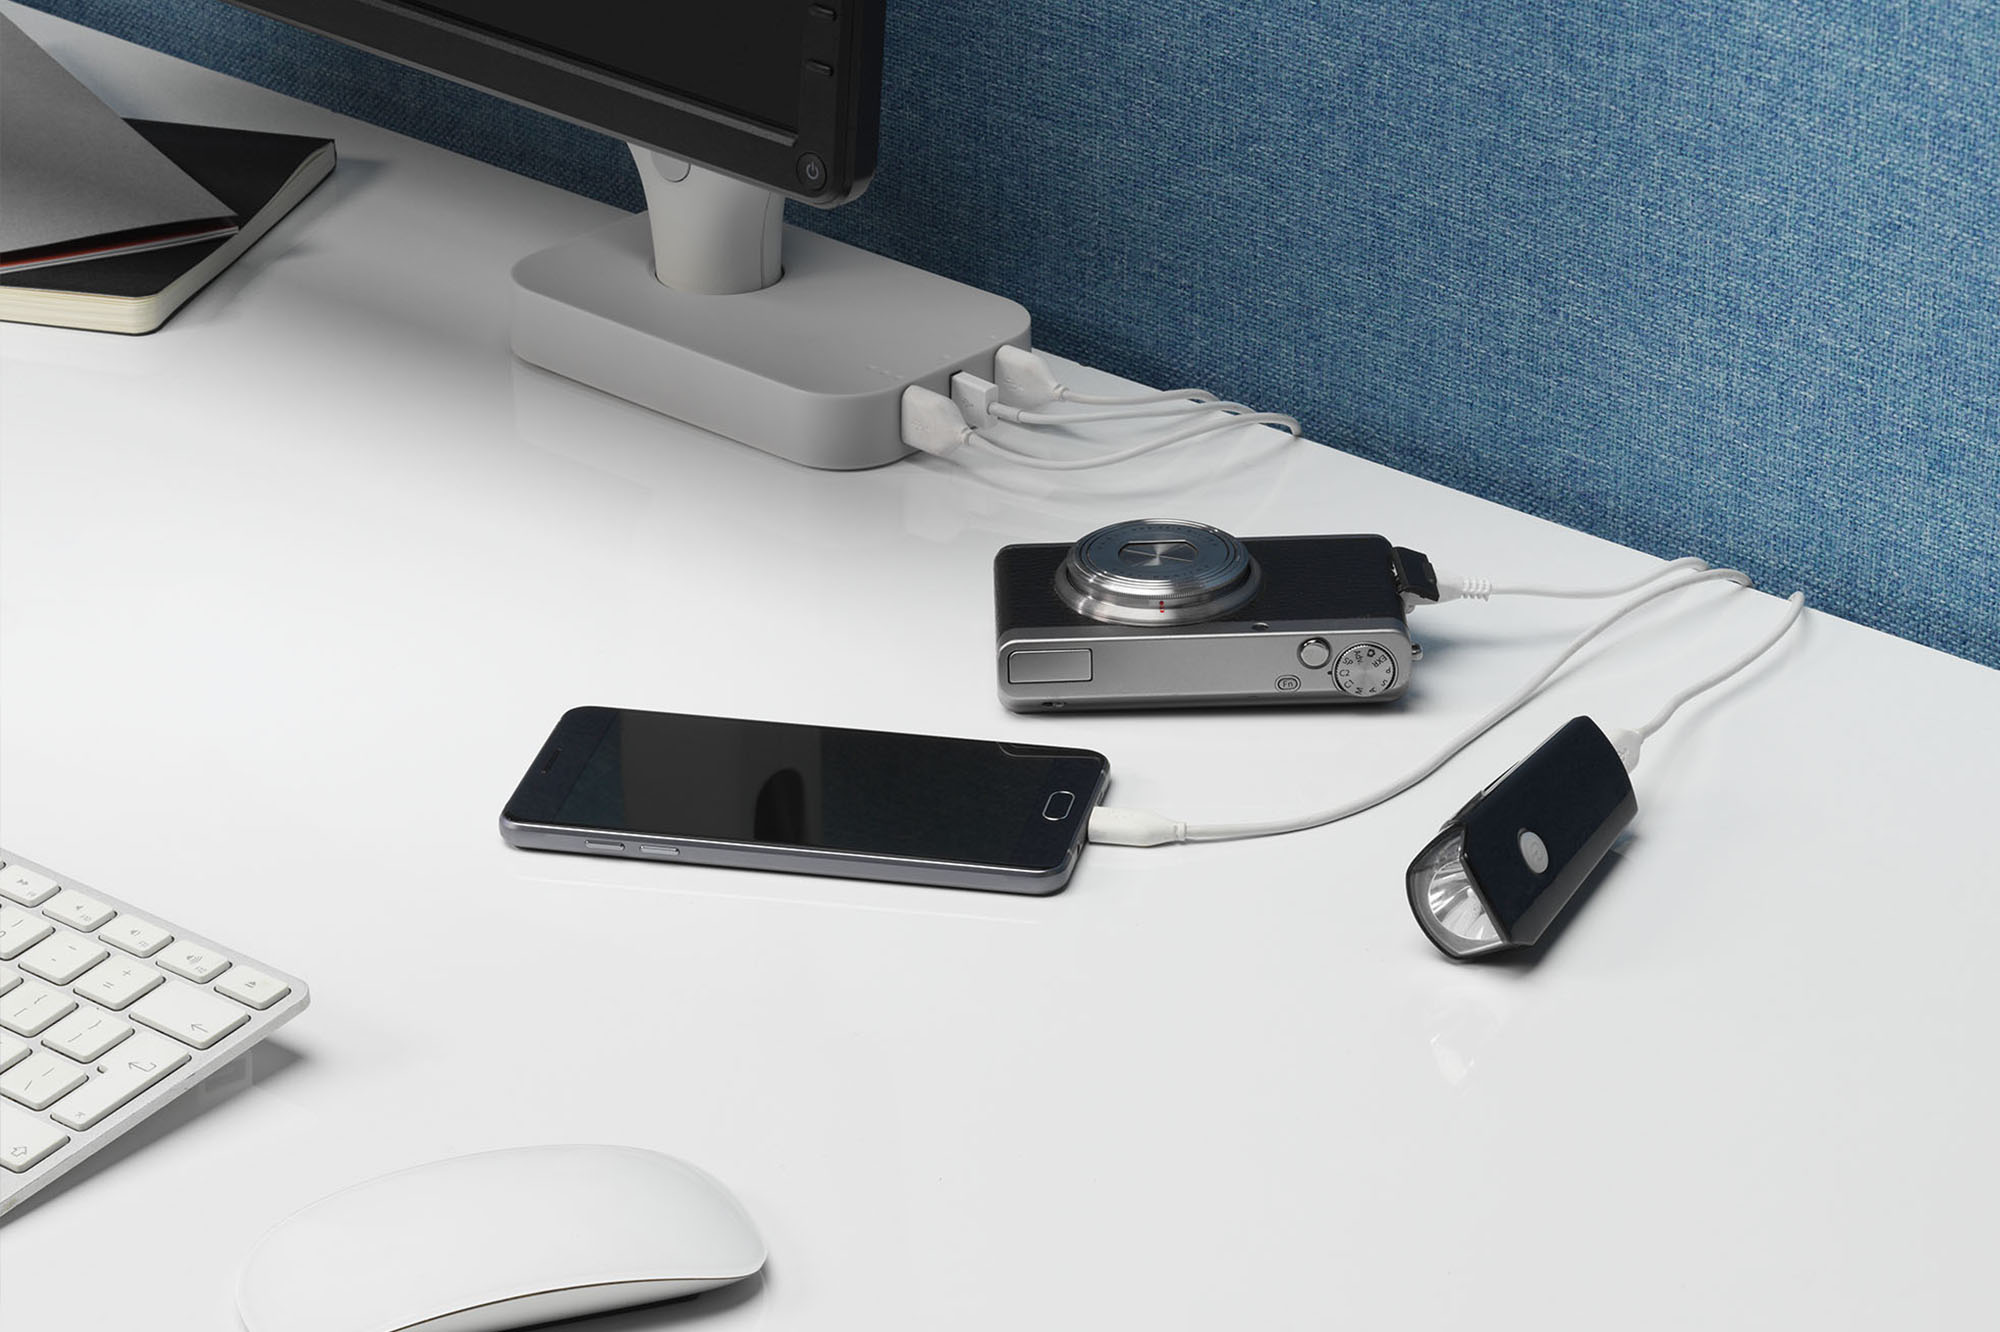 FPH_Desk6